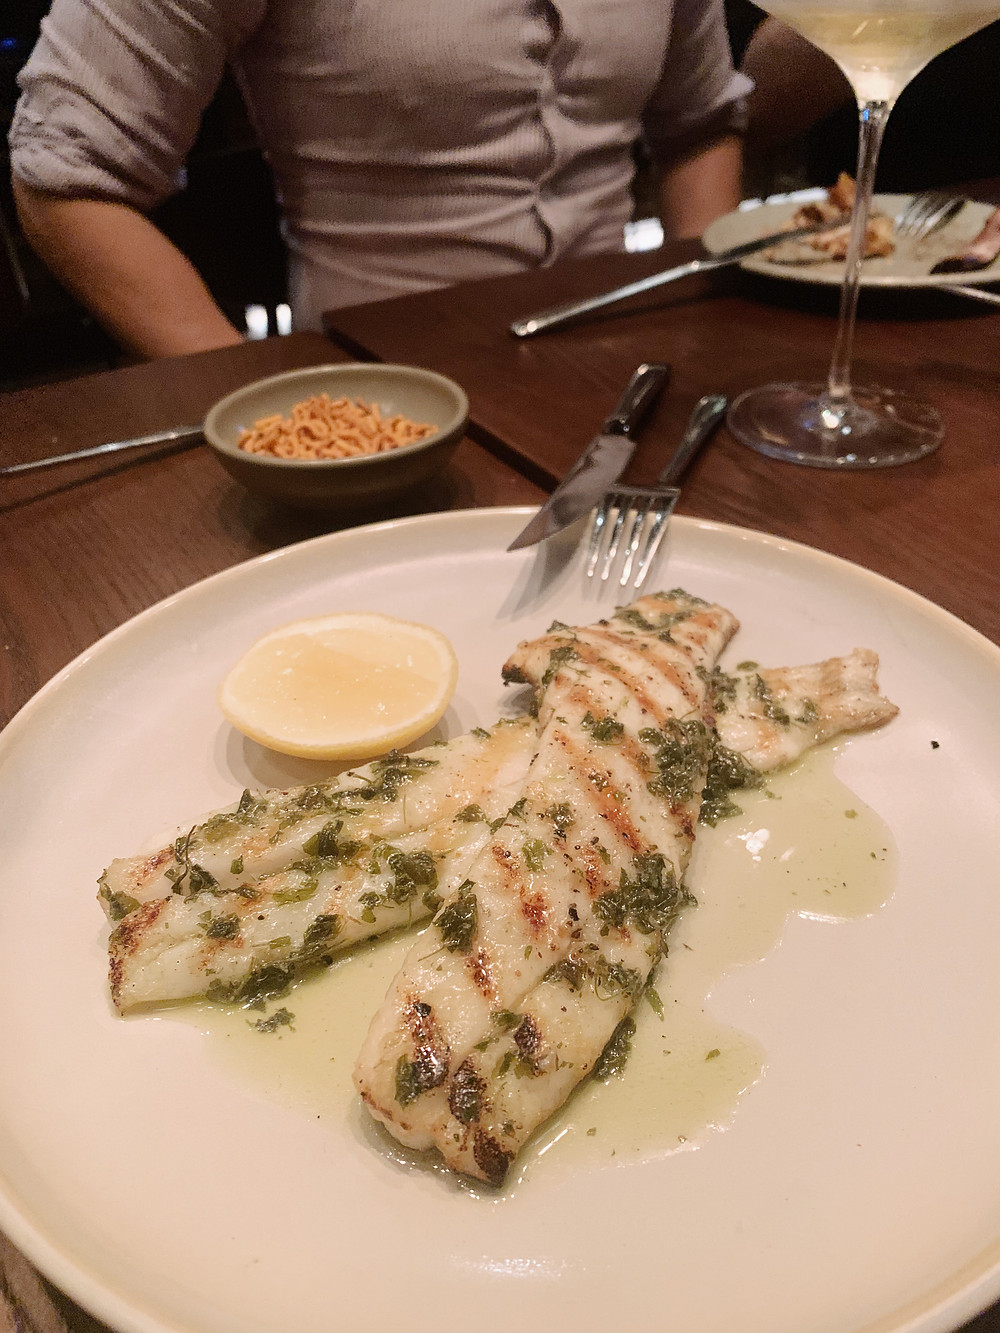 Food at Mr Brown restaurant in Hong Kong